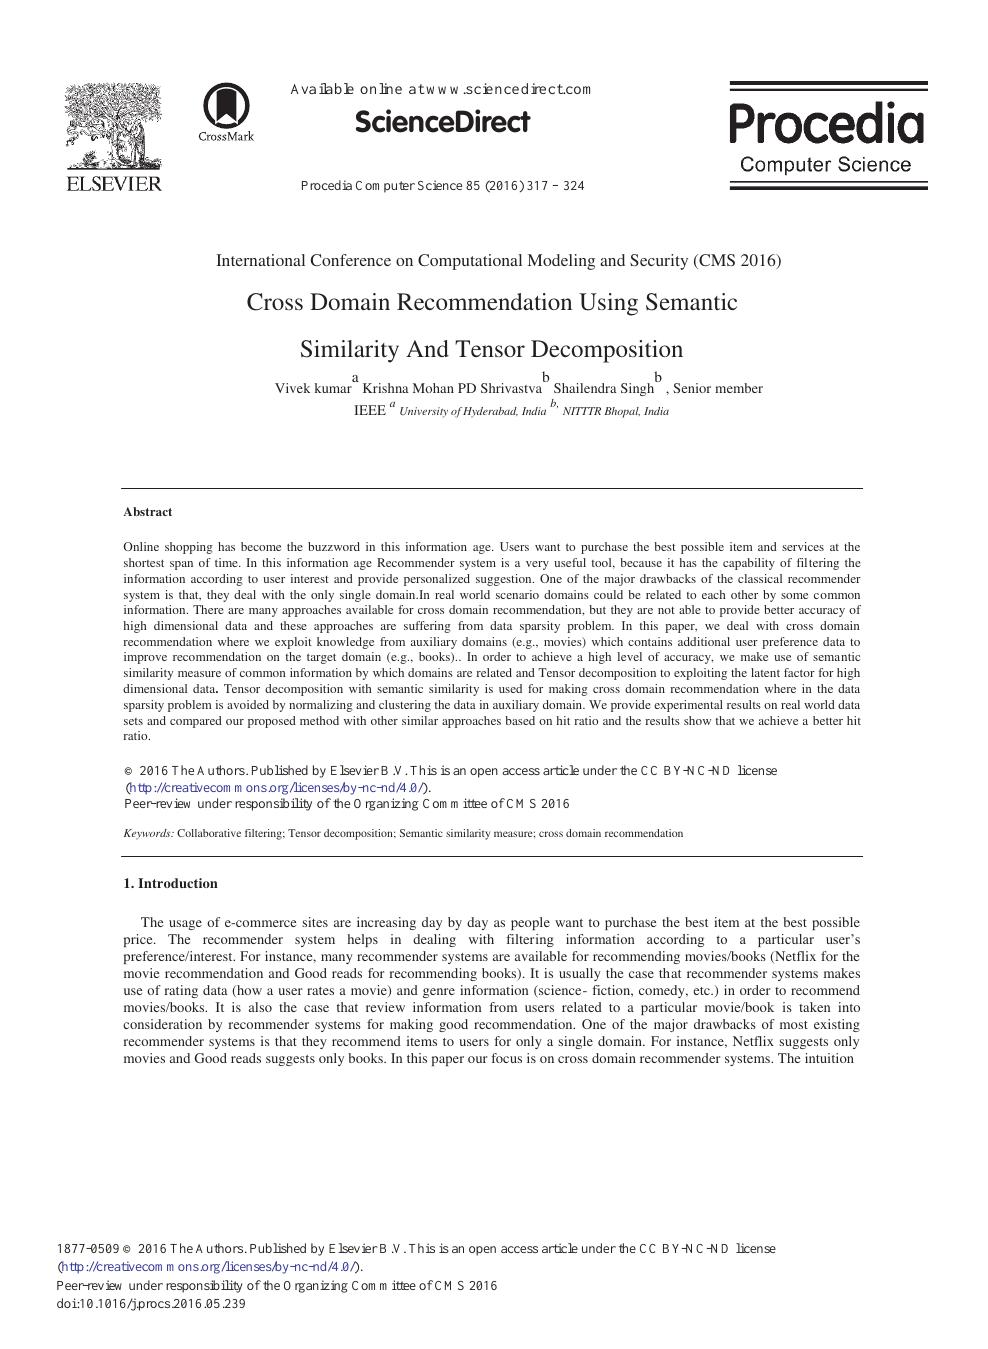 Cross Domain Recommendation Using Semantic Similarity and Tensor